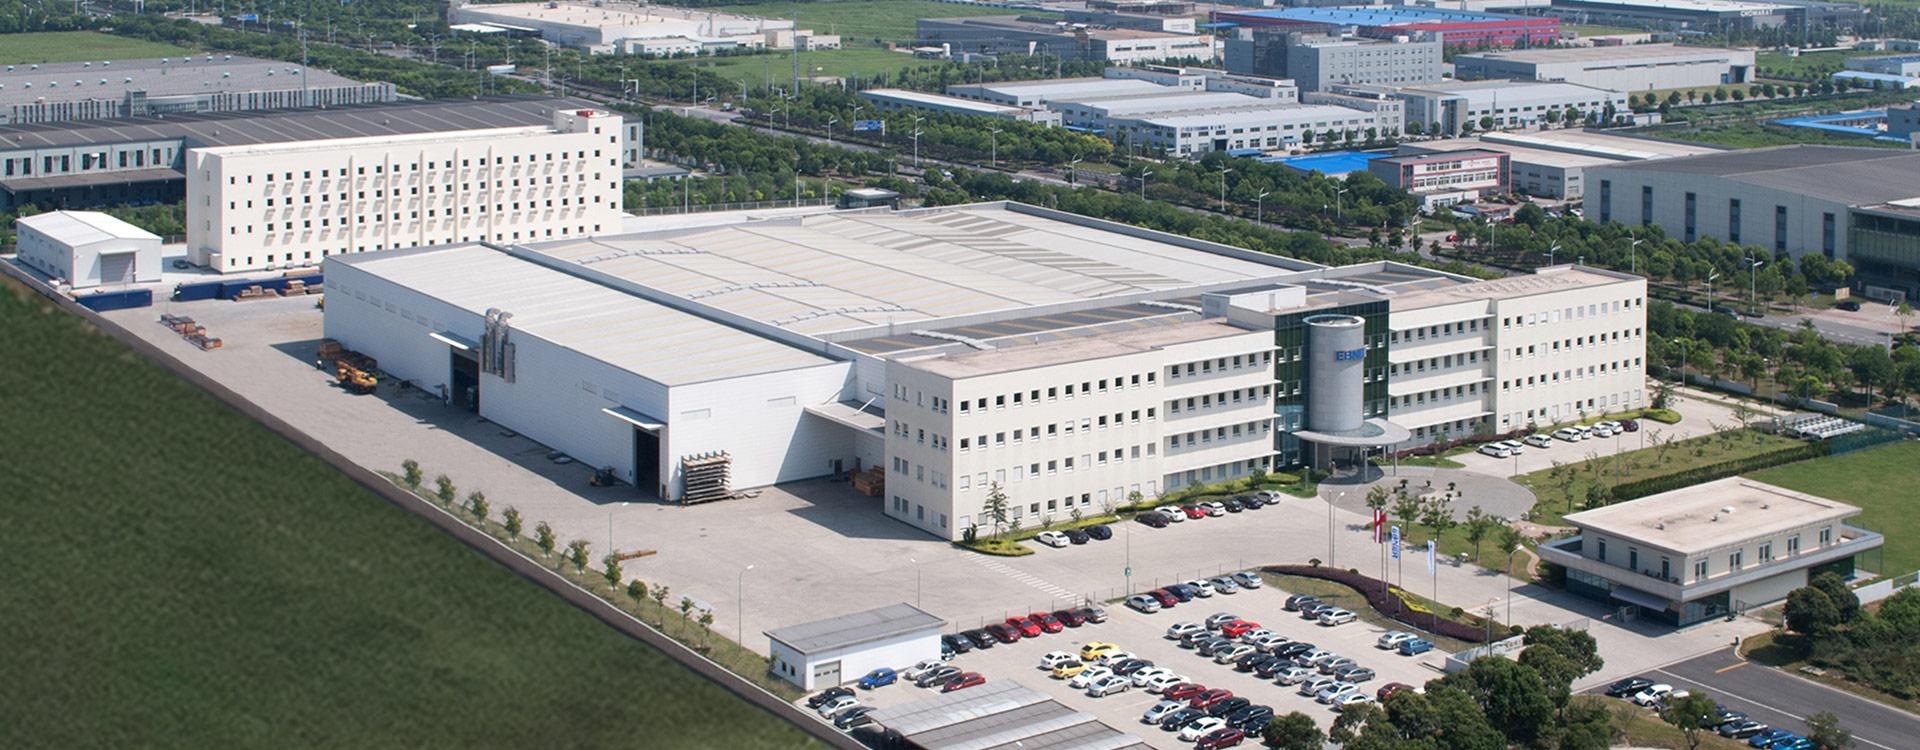 China - EBNER Group